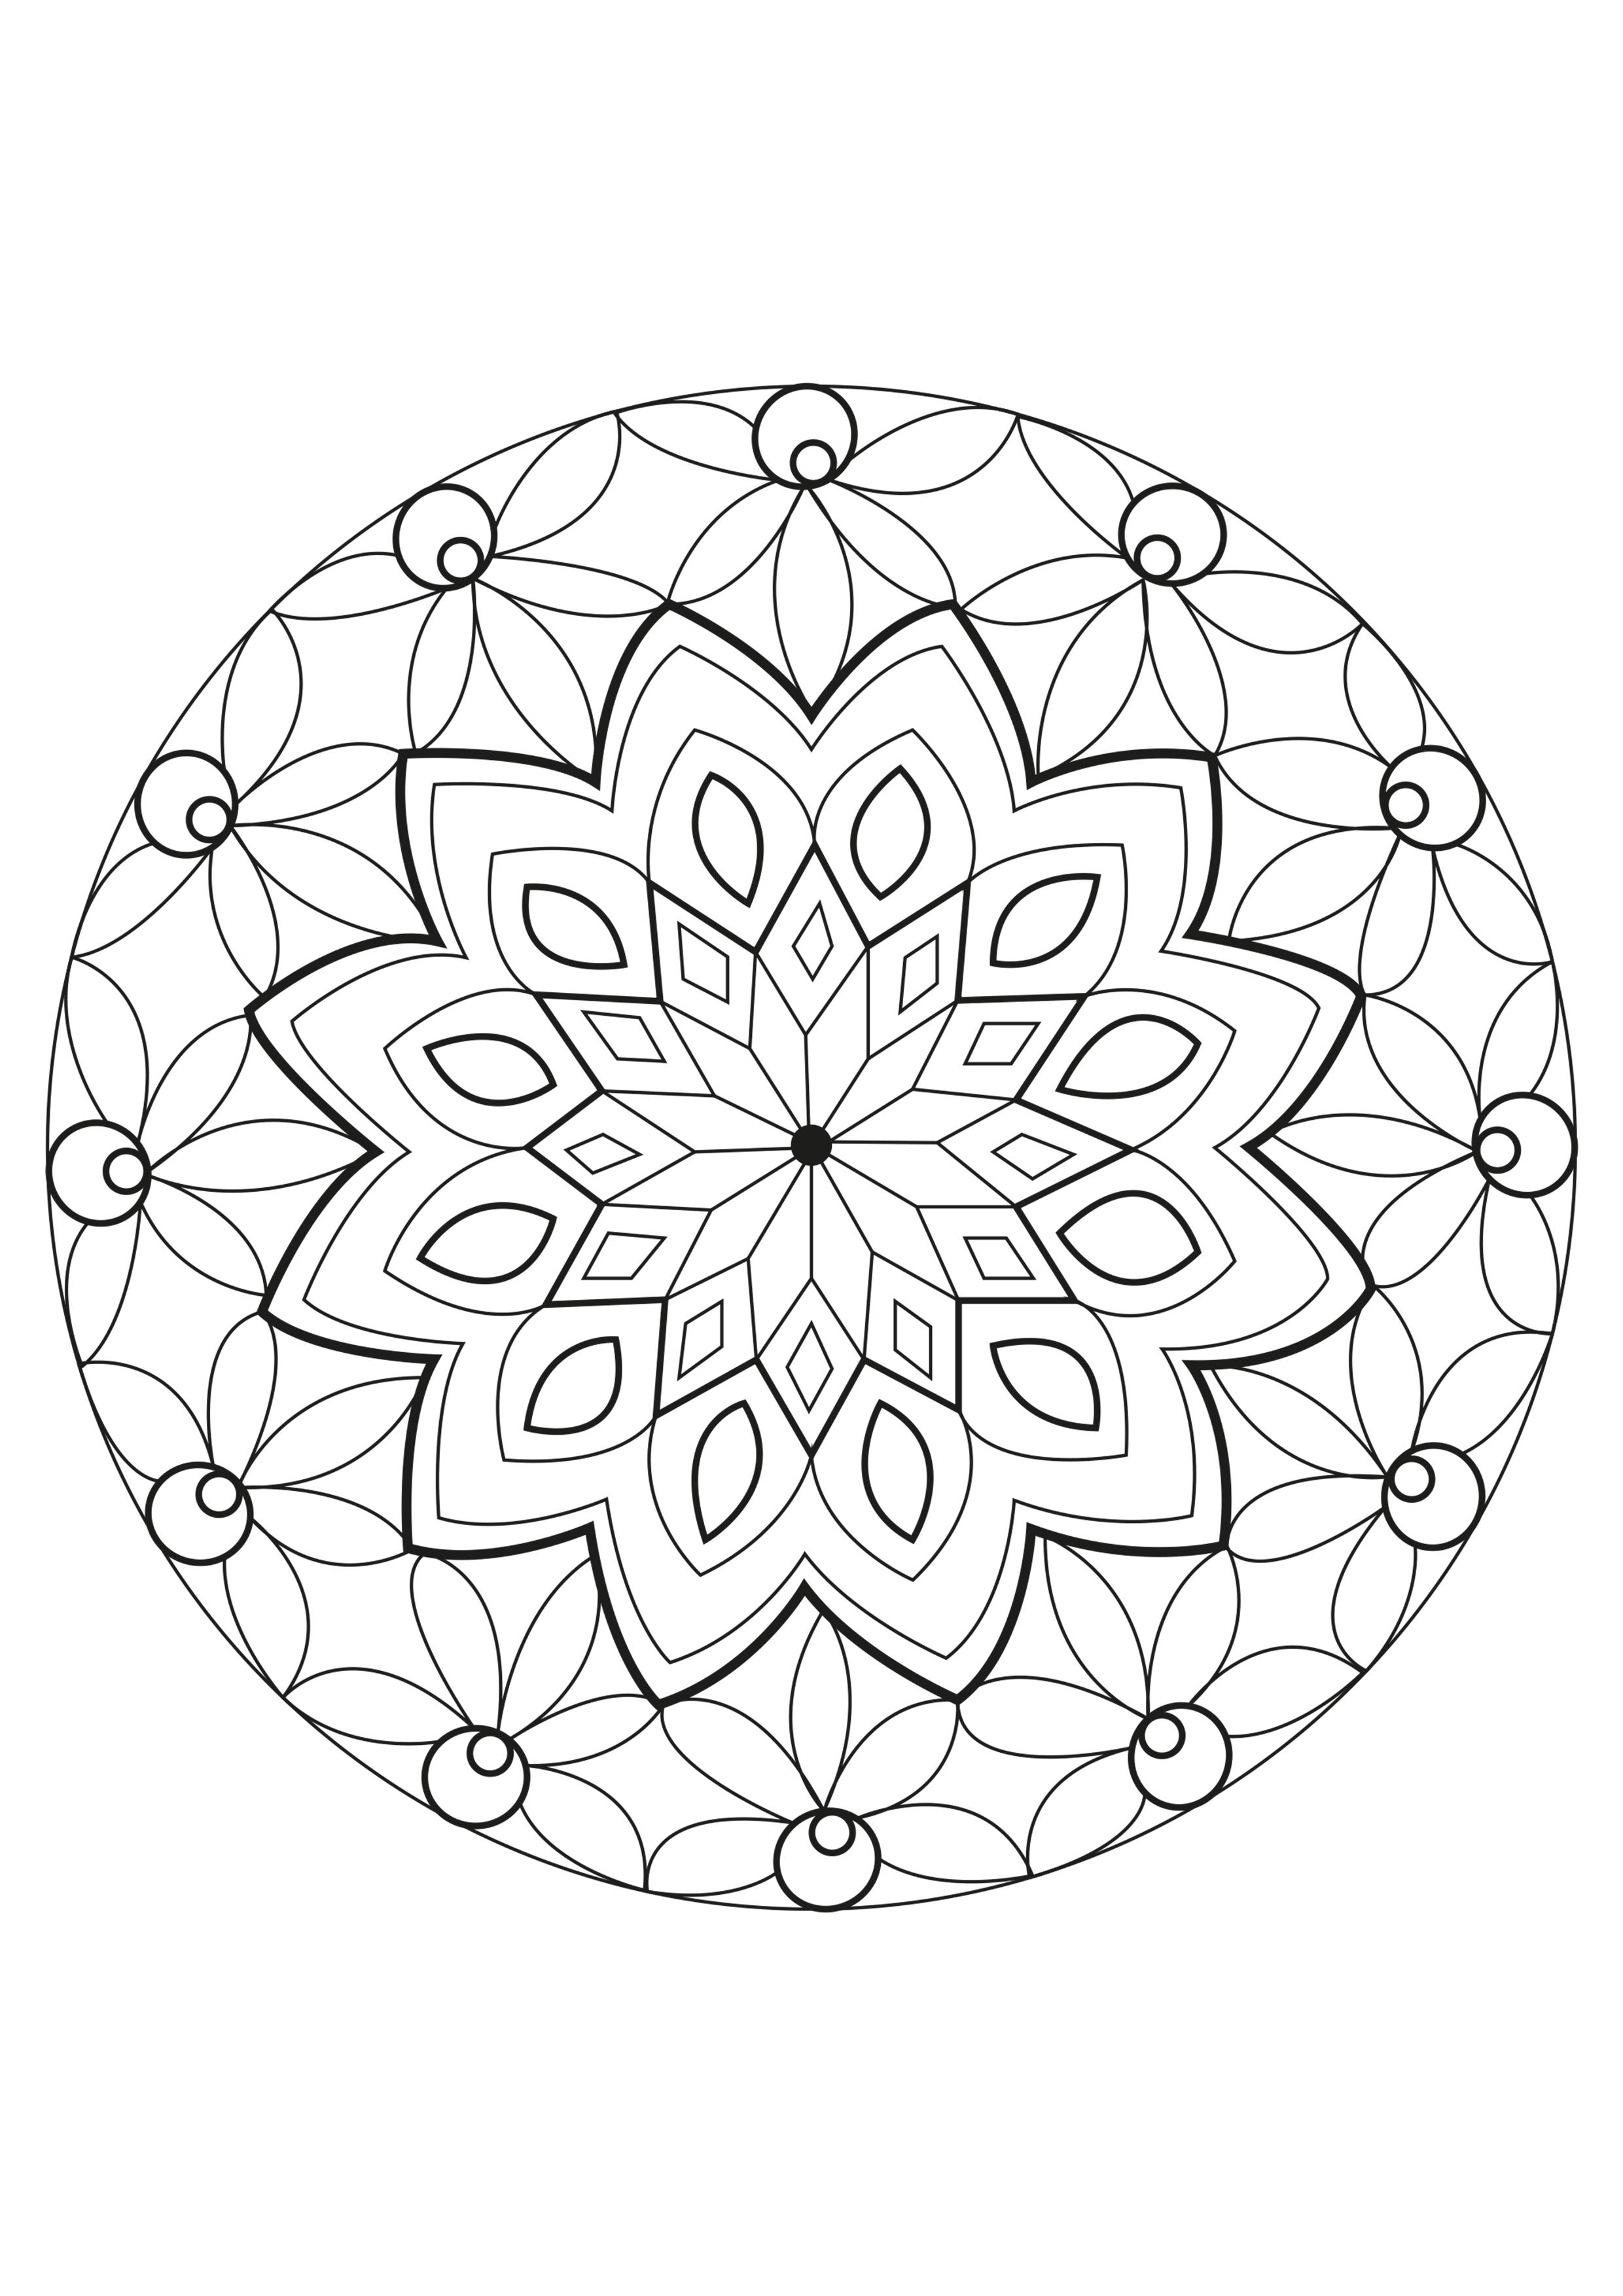 Colorear para adultos : Mandalas - 119